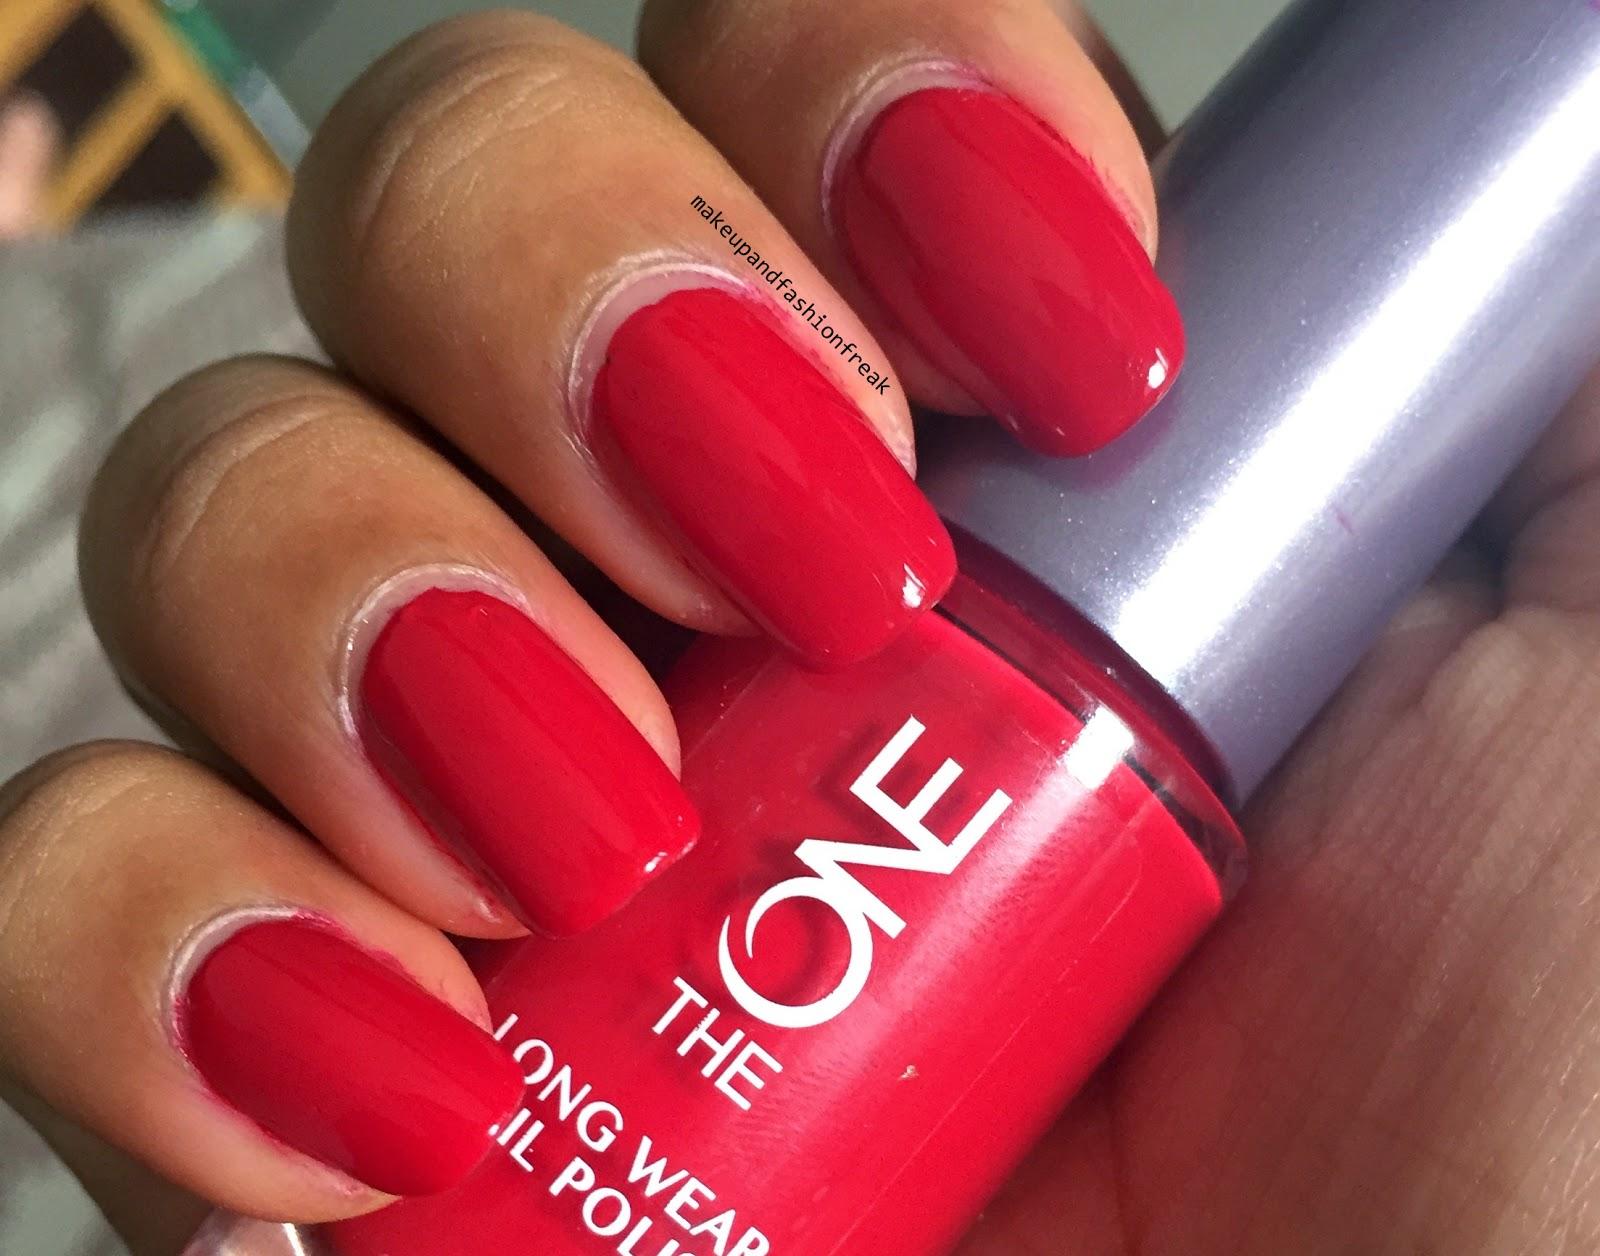 how to wear nail polish properly